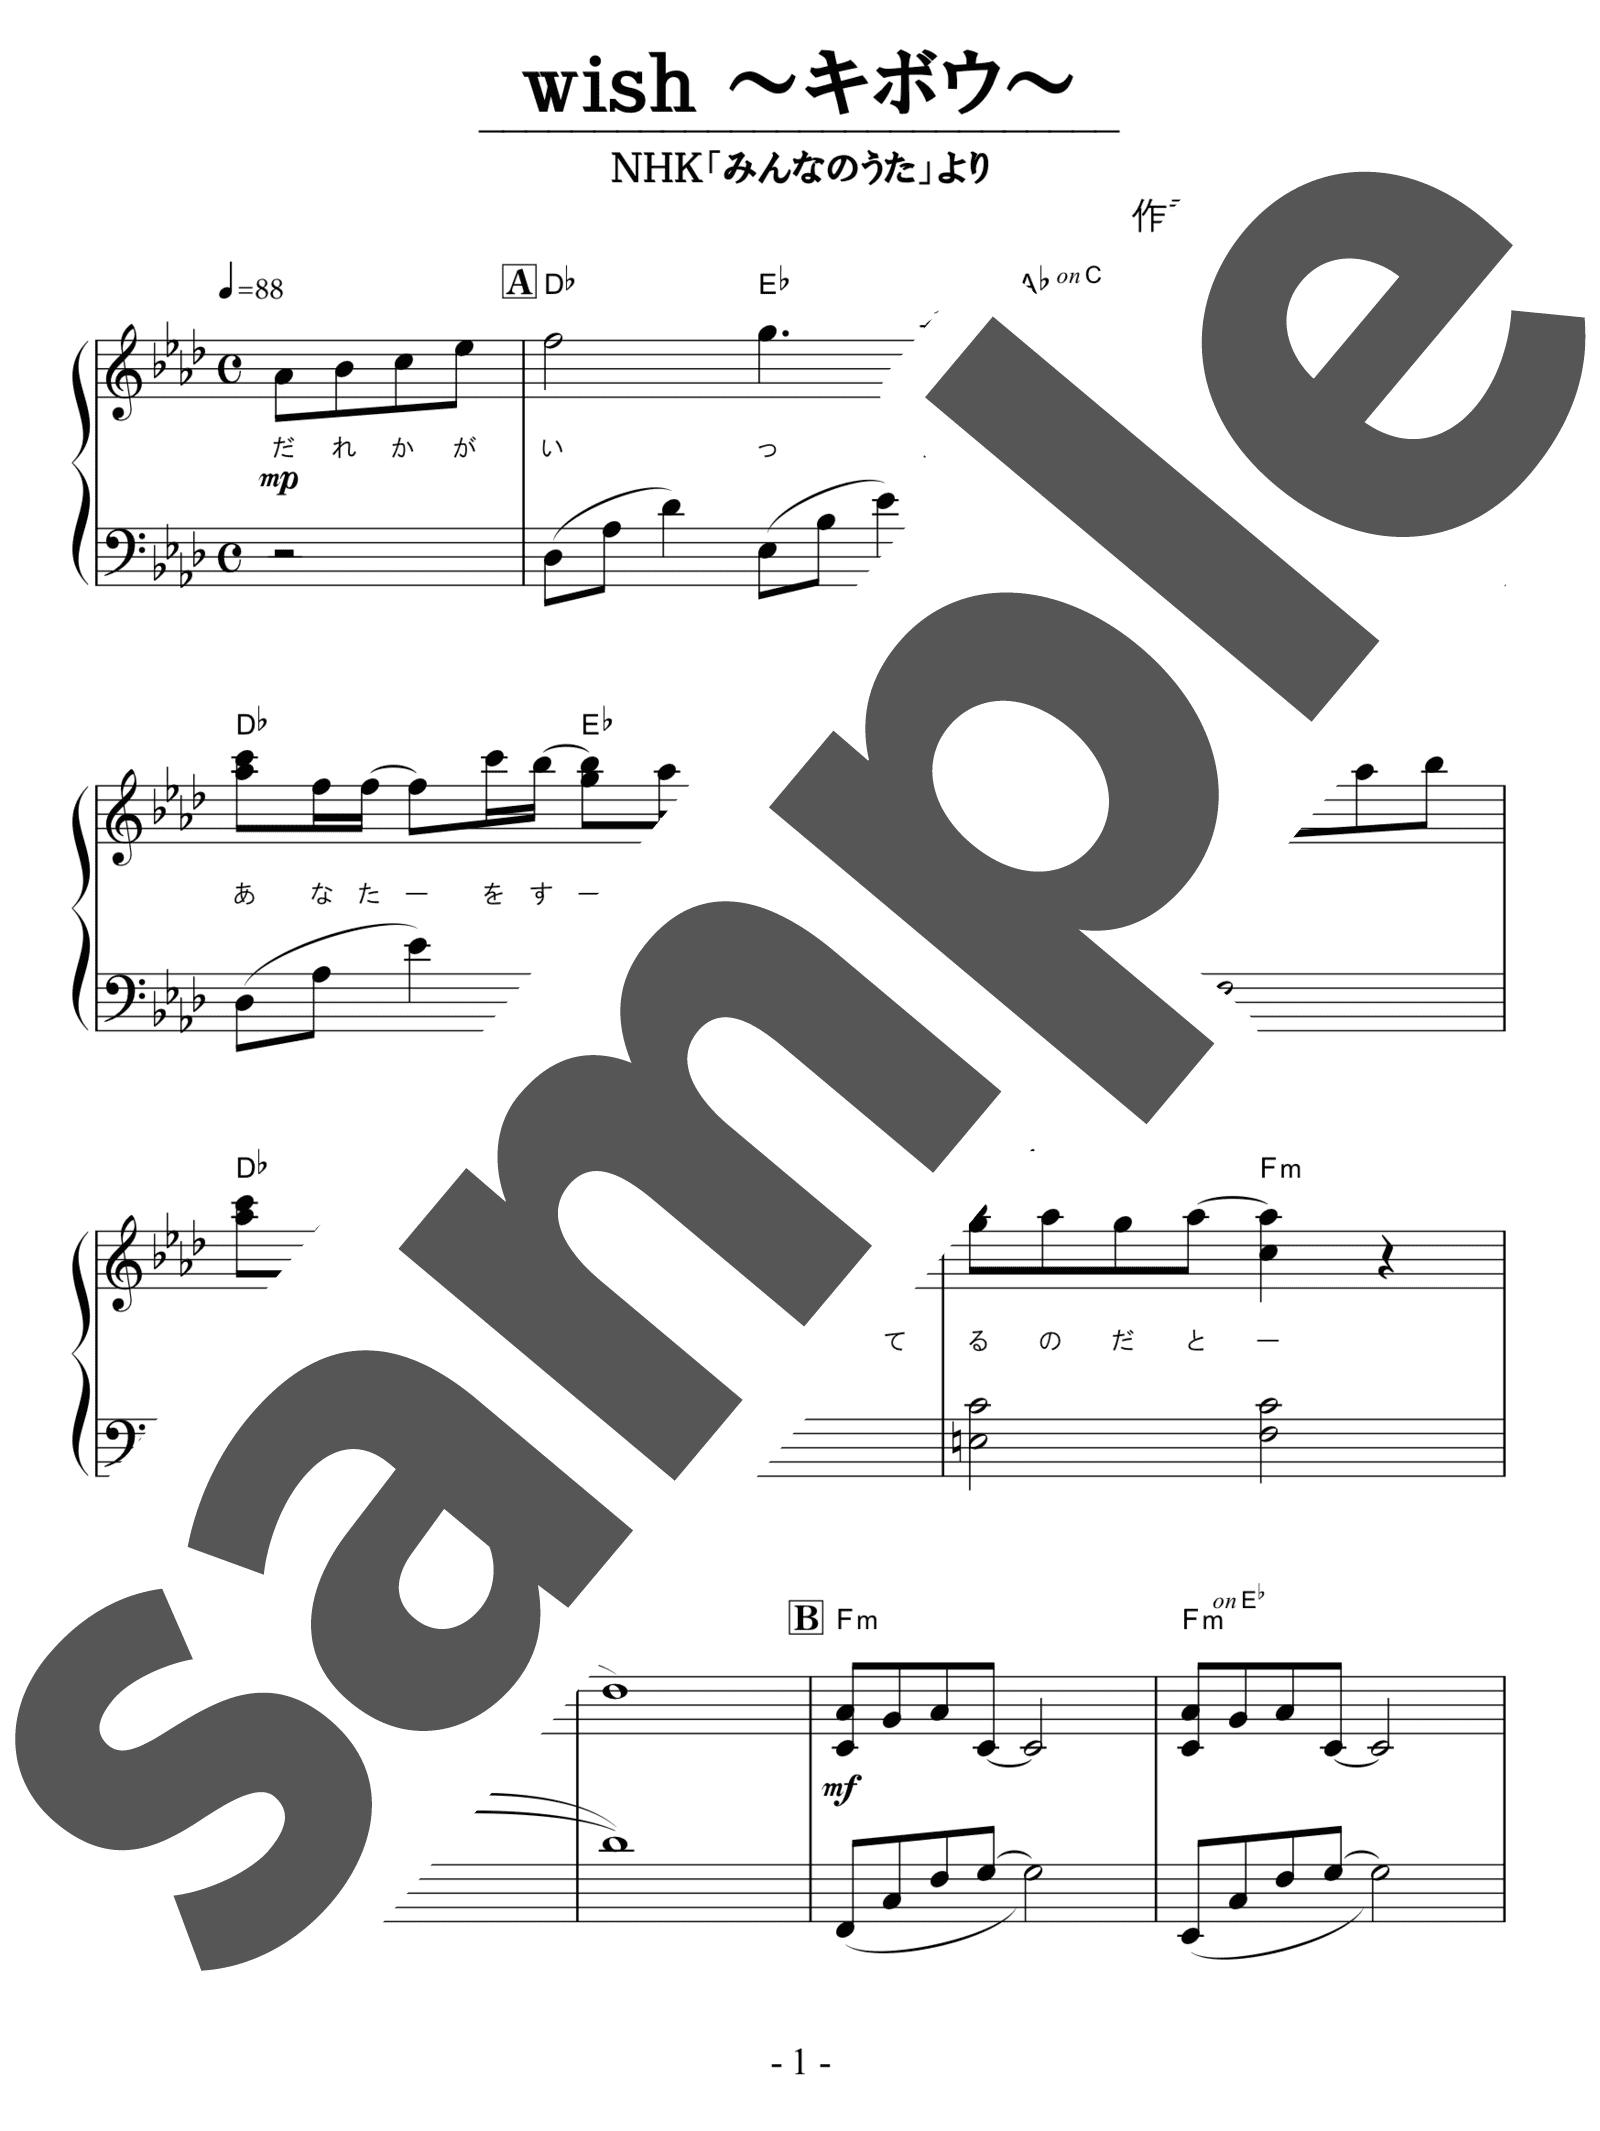 「wish ~キボウ~」のサンプル楽譜